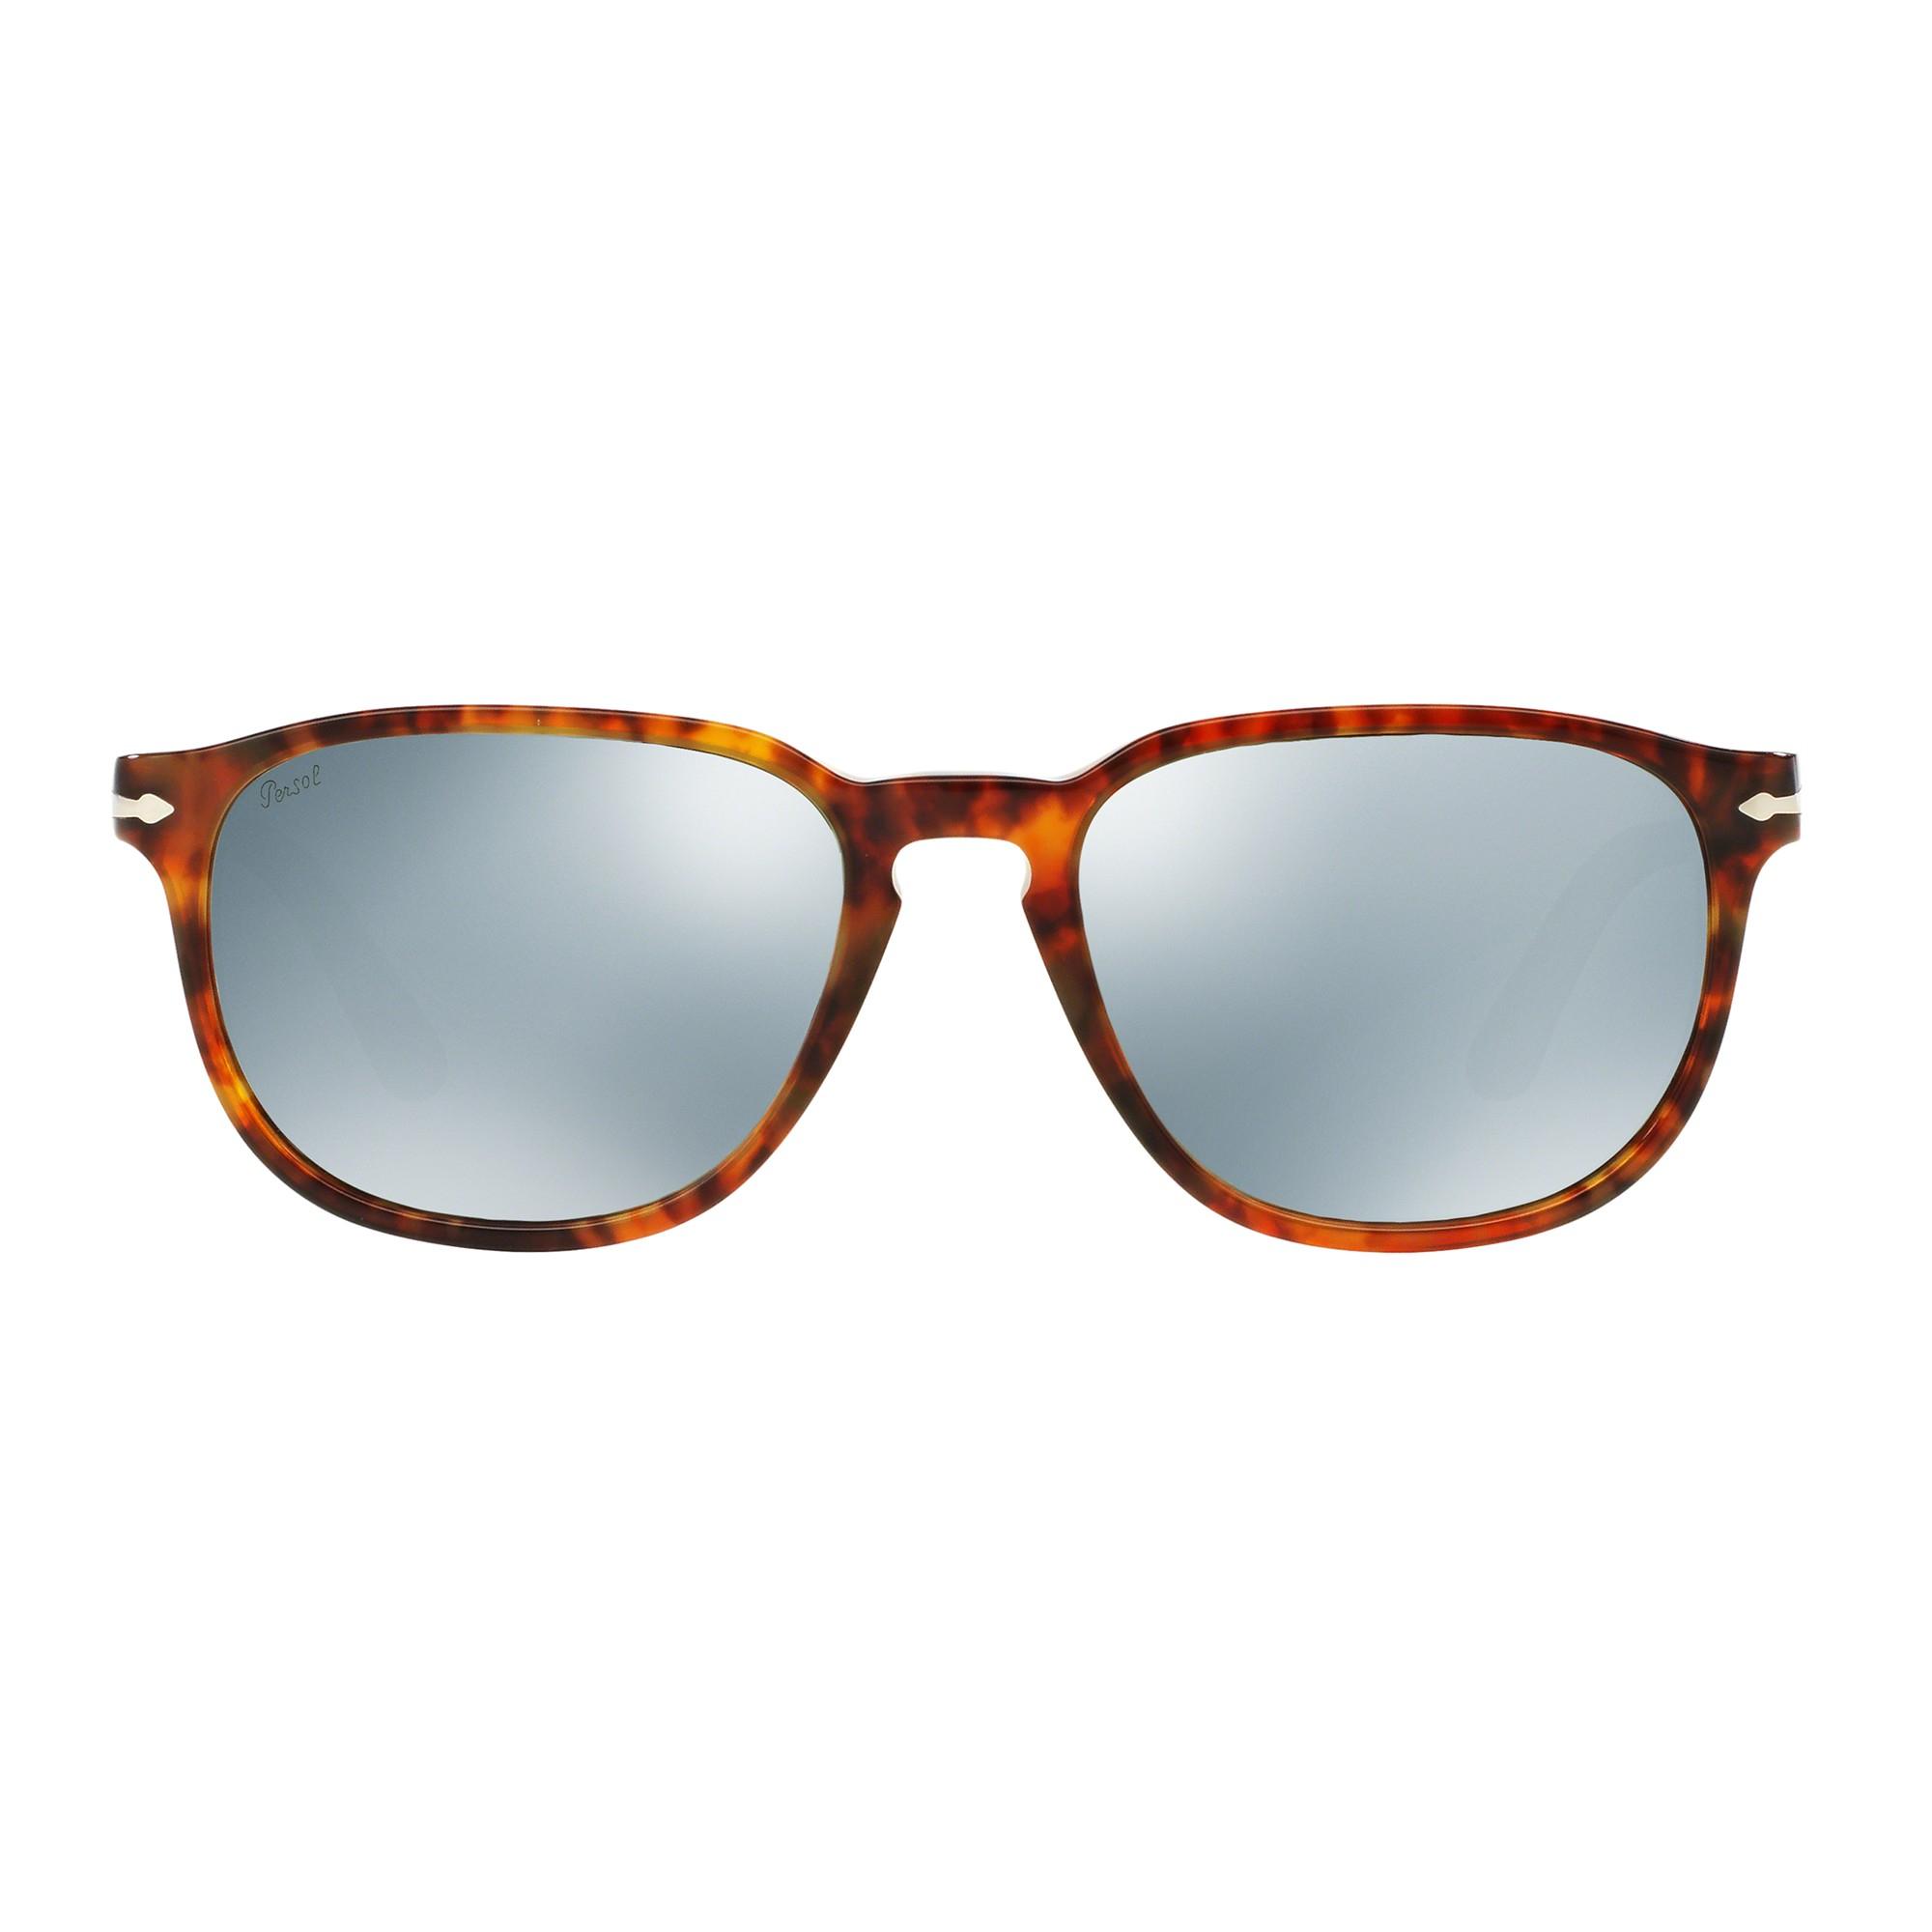 465bcc65675d Persol Po3019s Square Sunglasses in Brown - Lyst